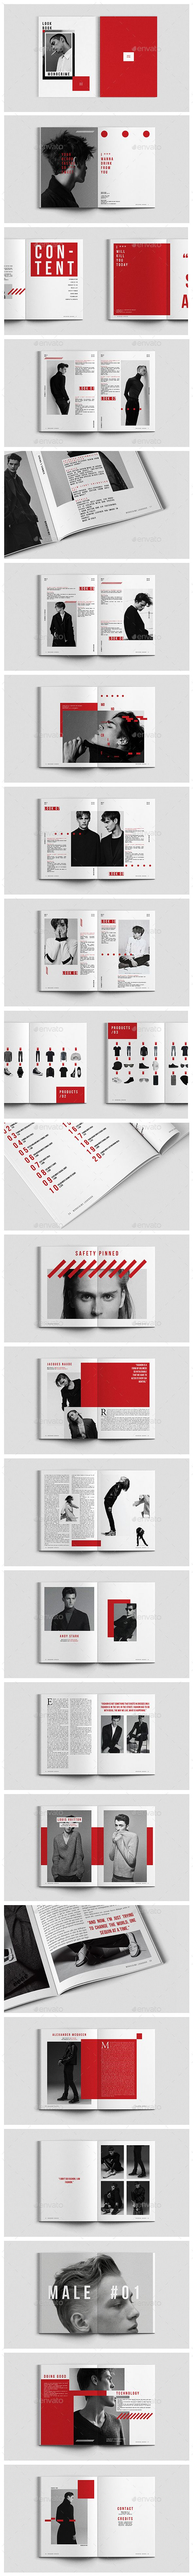 Fashion Magazine Lookbook Magazines Print Templates